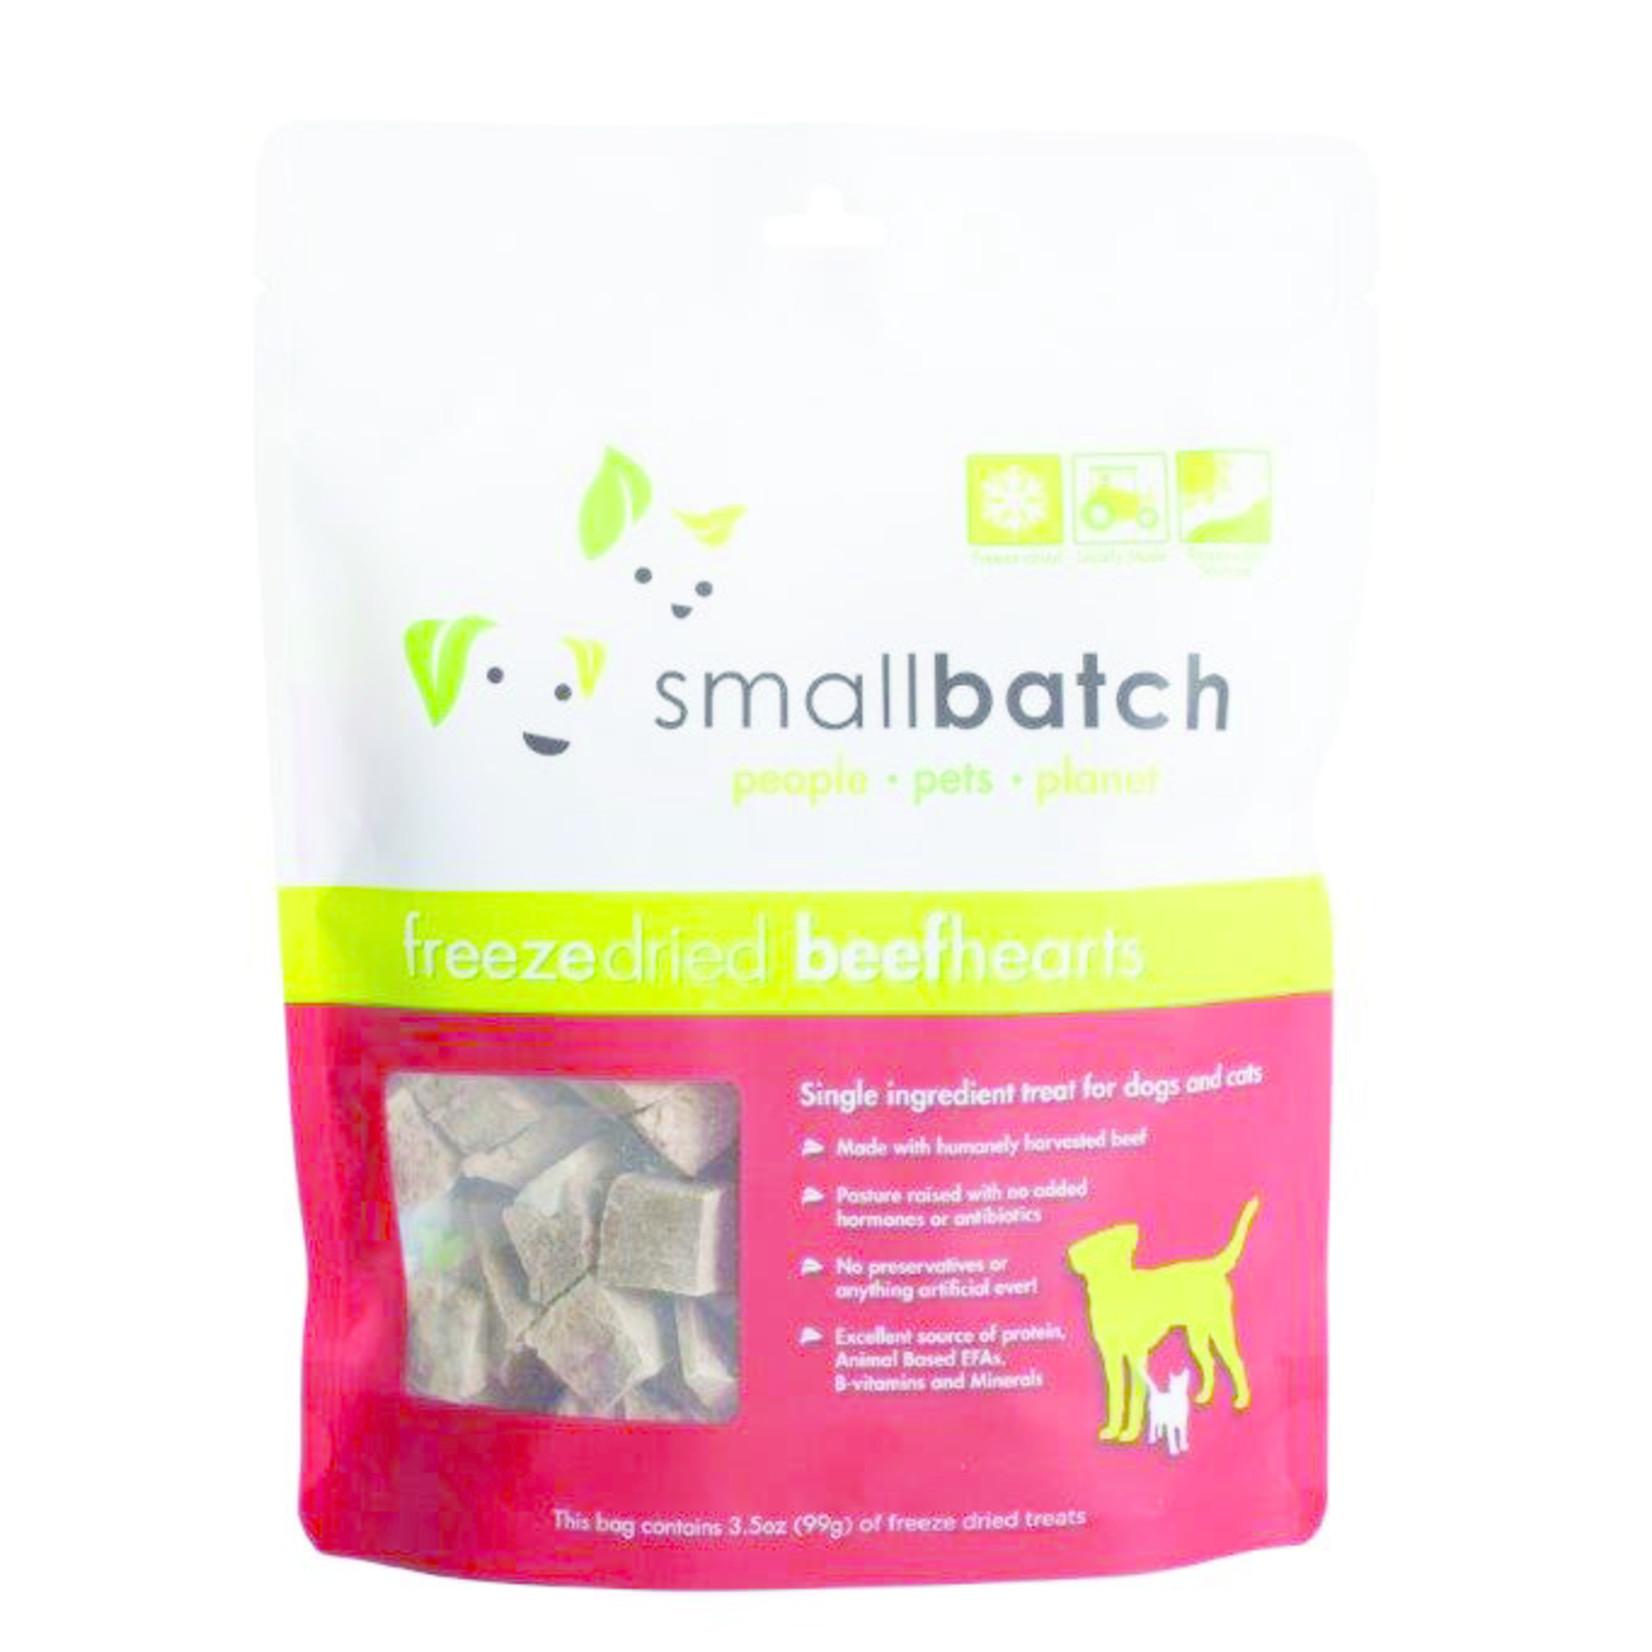 Small Batch Small Batch Freeze-dried Beef Hearts 3.5 OZ